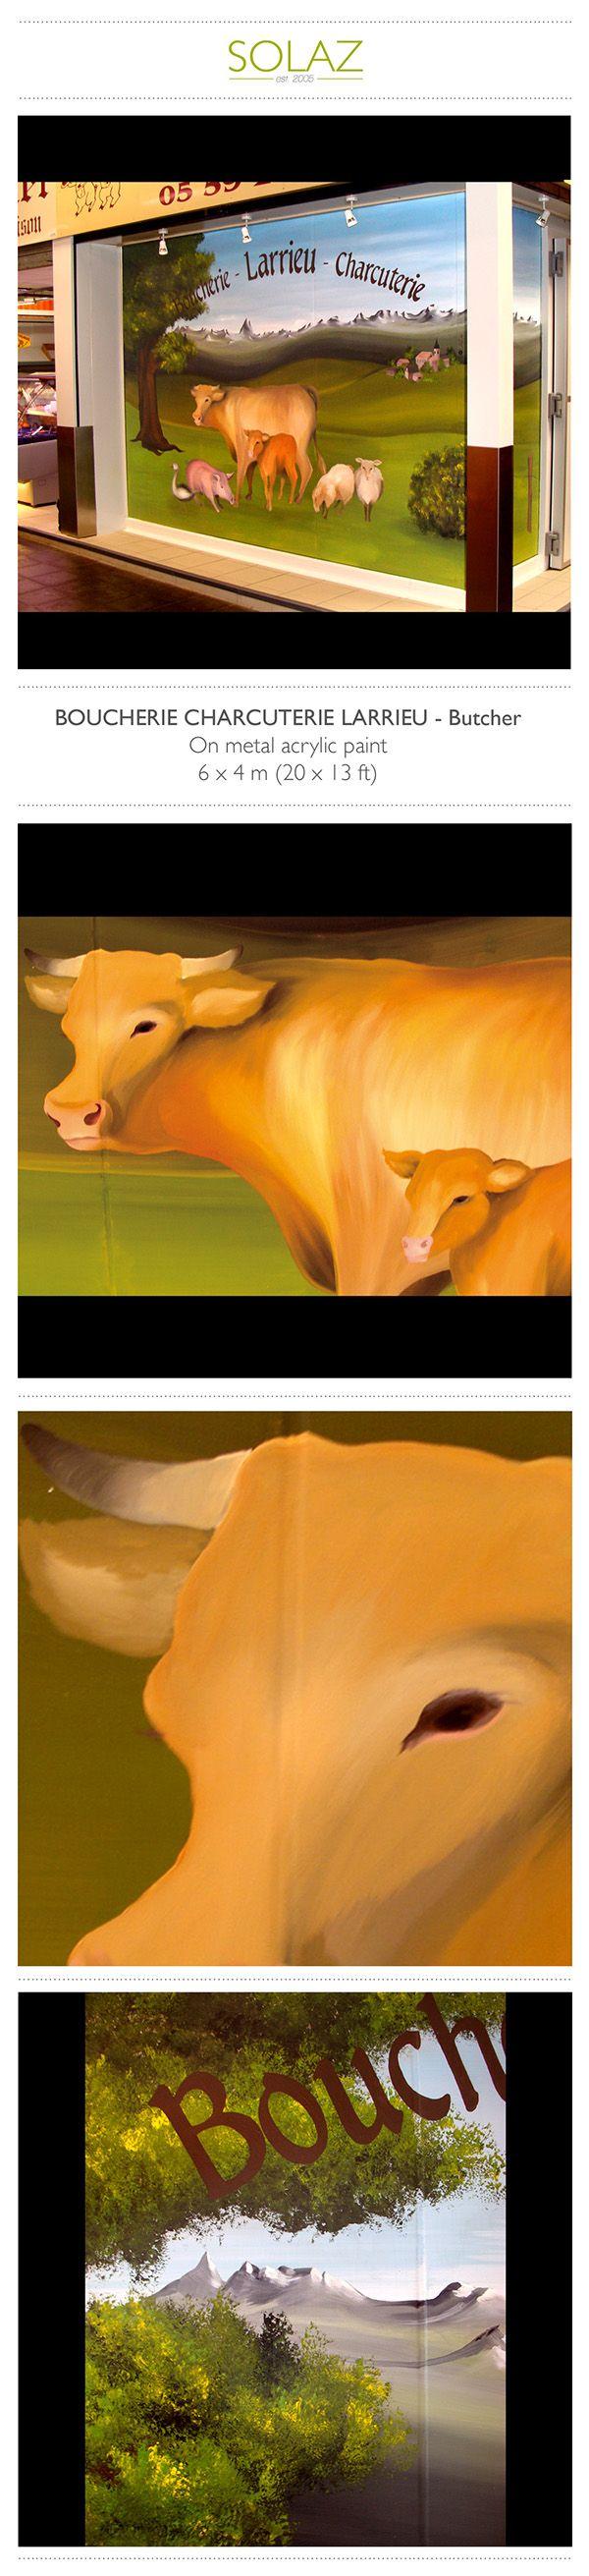 BOUCHERIE CHARCUTERIE LARRIEU - Butcher by Helene Bataille, via Behance -  www.designbysolaz.com #drawing #illustration #painting #paint #mural #wallpainting #sheet #cow #duck #sudouest #france #landscape #mountains #artisanal #shop #handwork